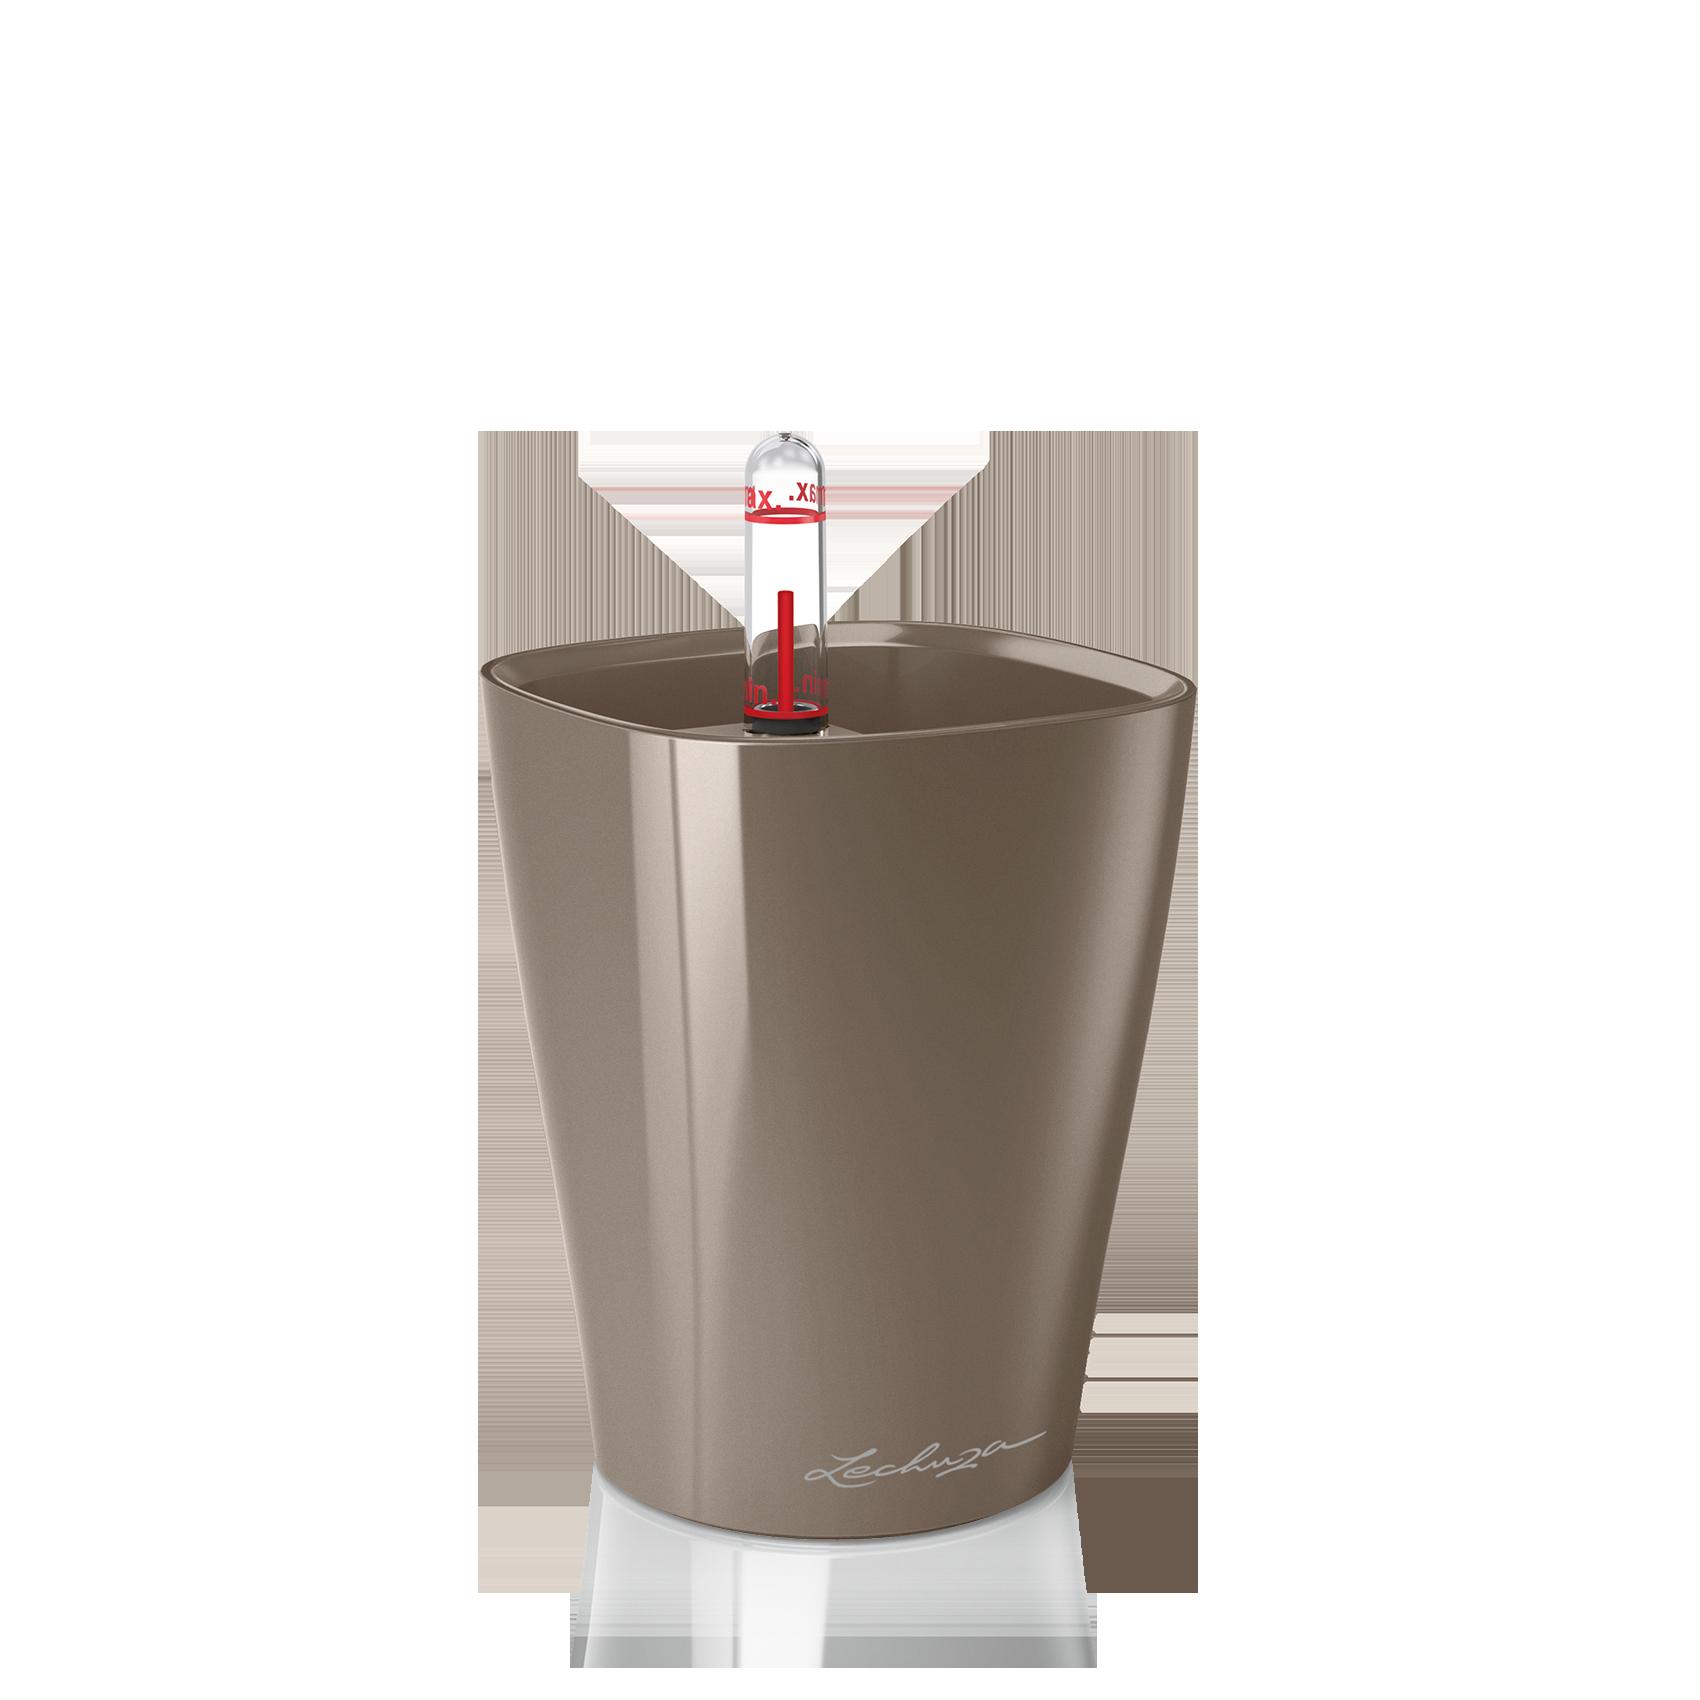 MINI-DELTINI серо-коричневый блестящий